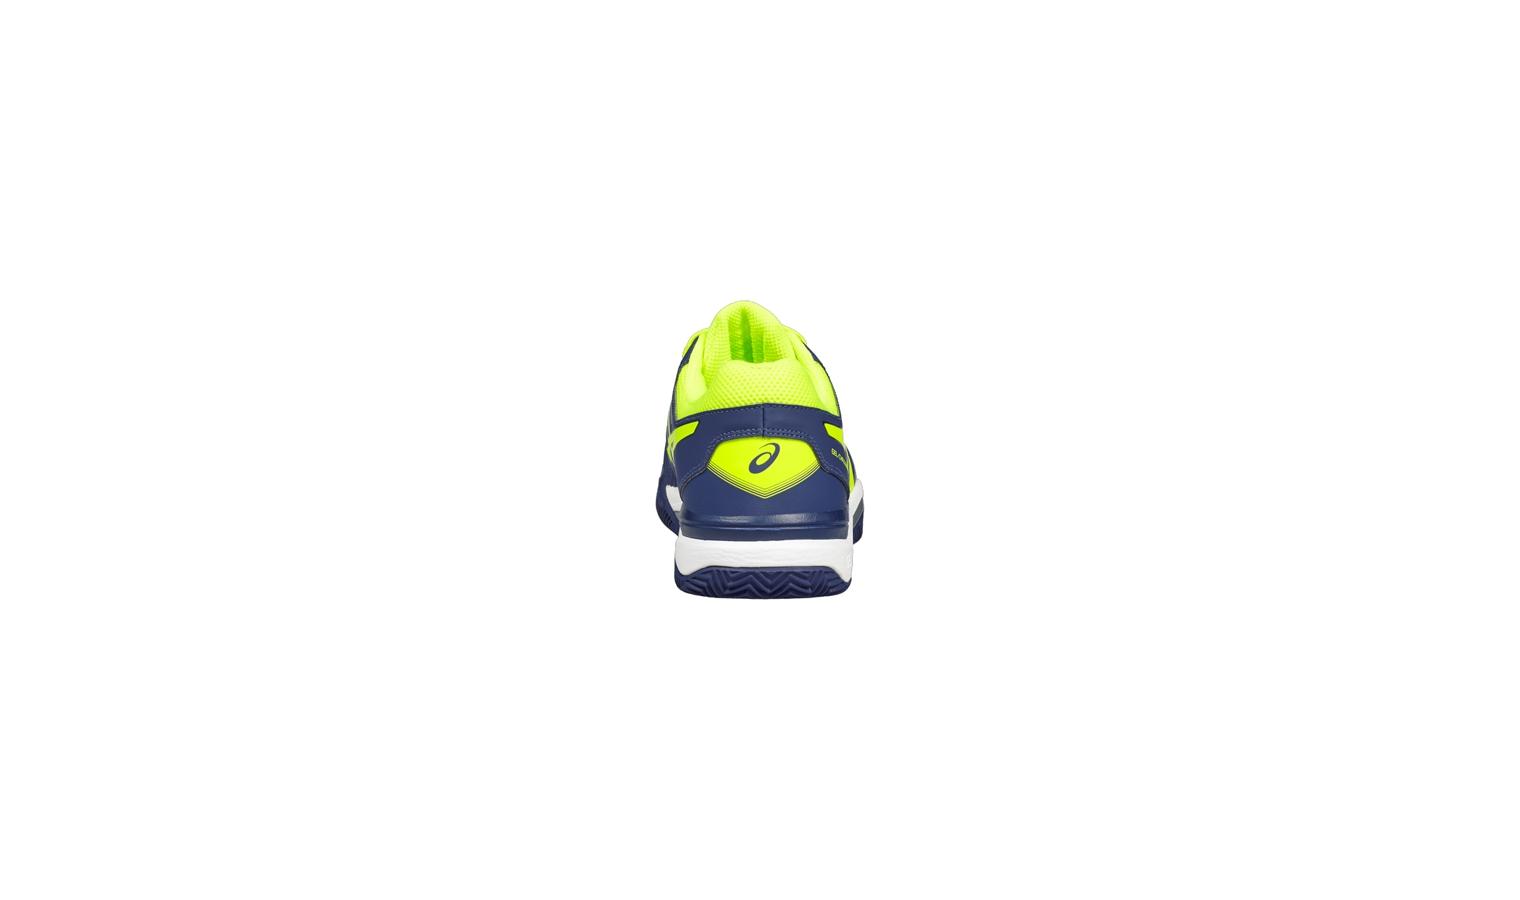 f6e54a2809b Pánské tenisové boty Asics GEL-CHALLENGER 11 CLAY modré